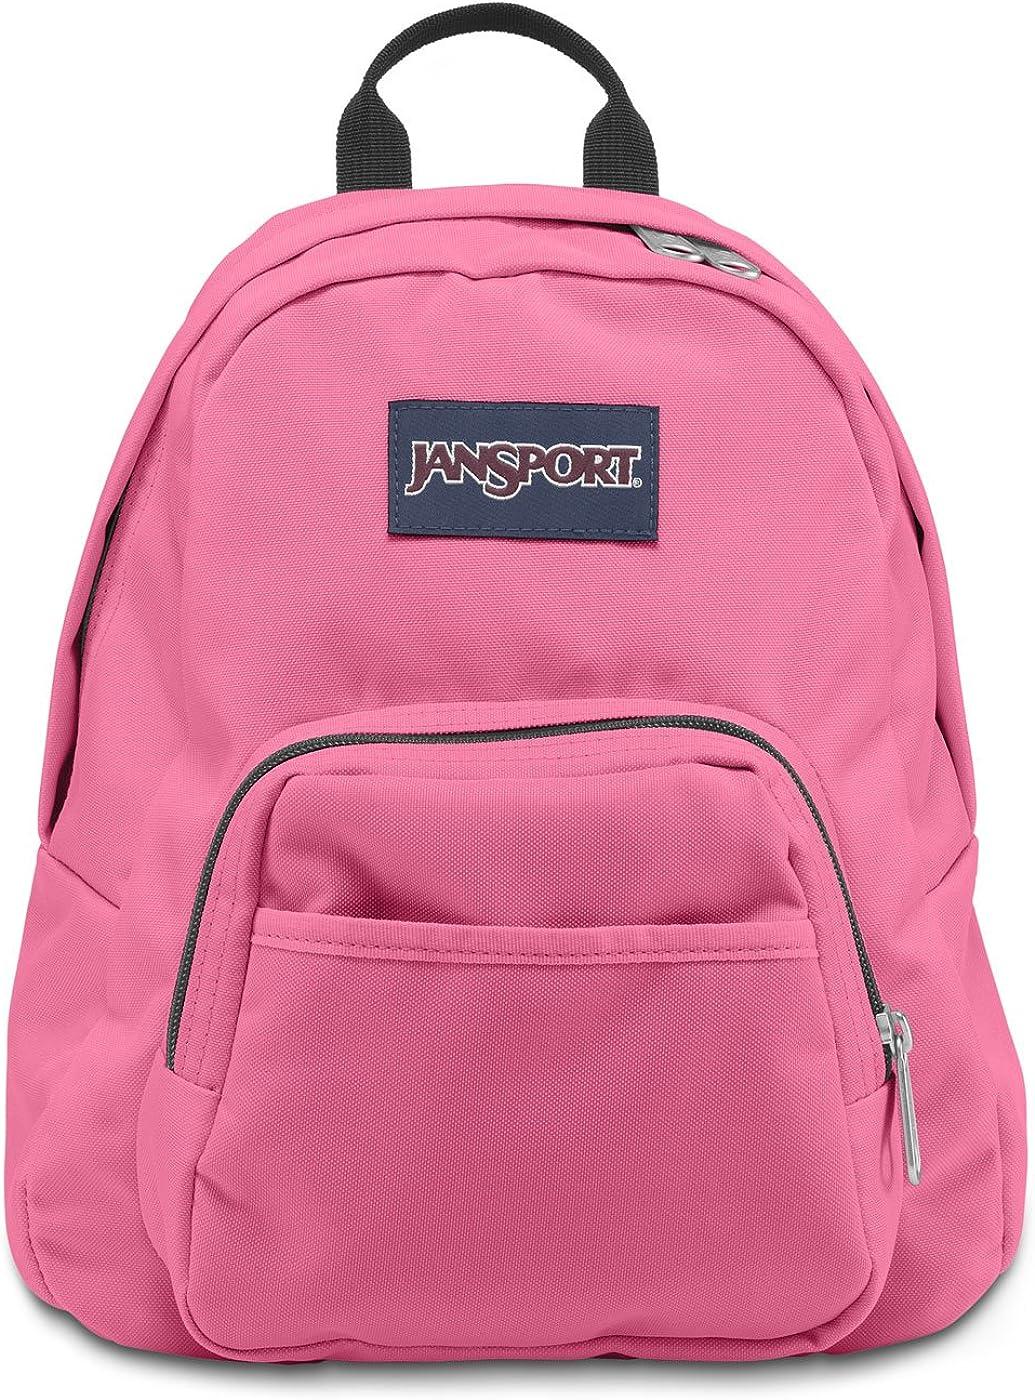 JanSport Half Pint Backpack Pink Pansy TDH69SF